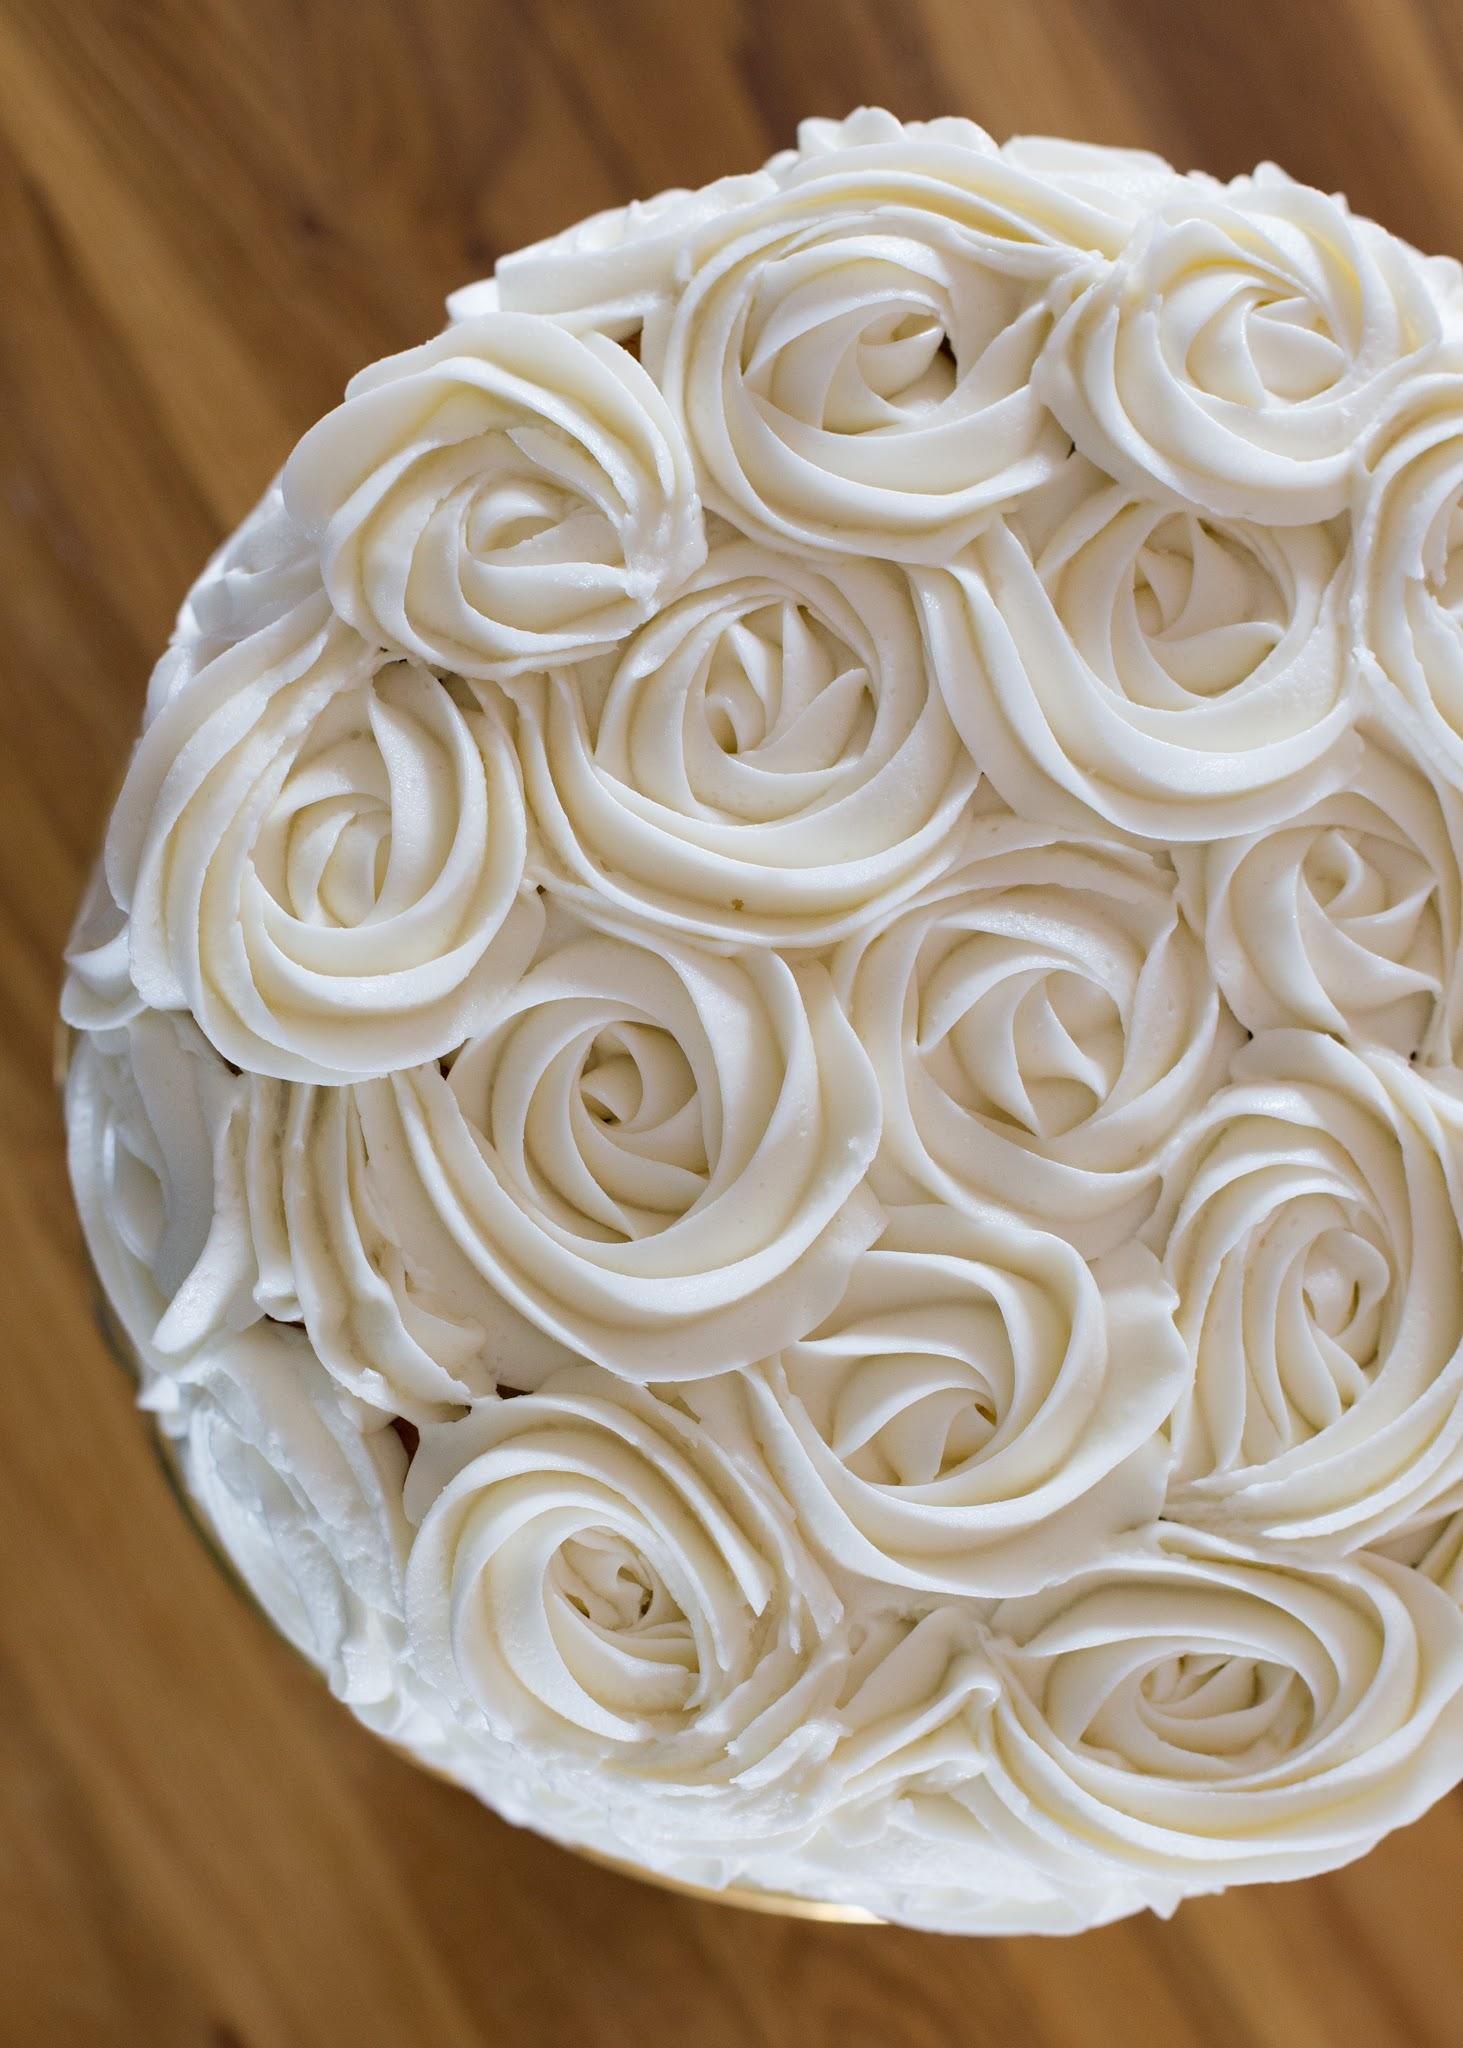 how to make a rose cake